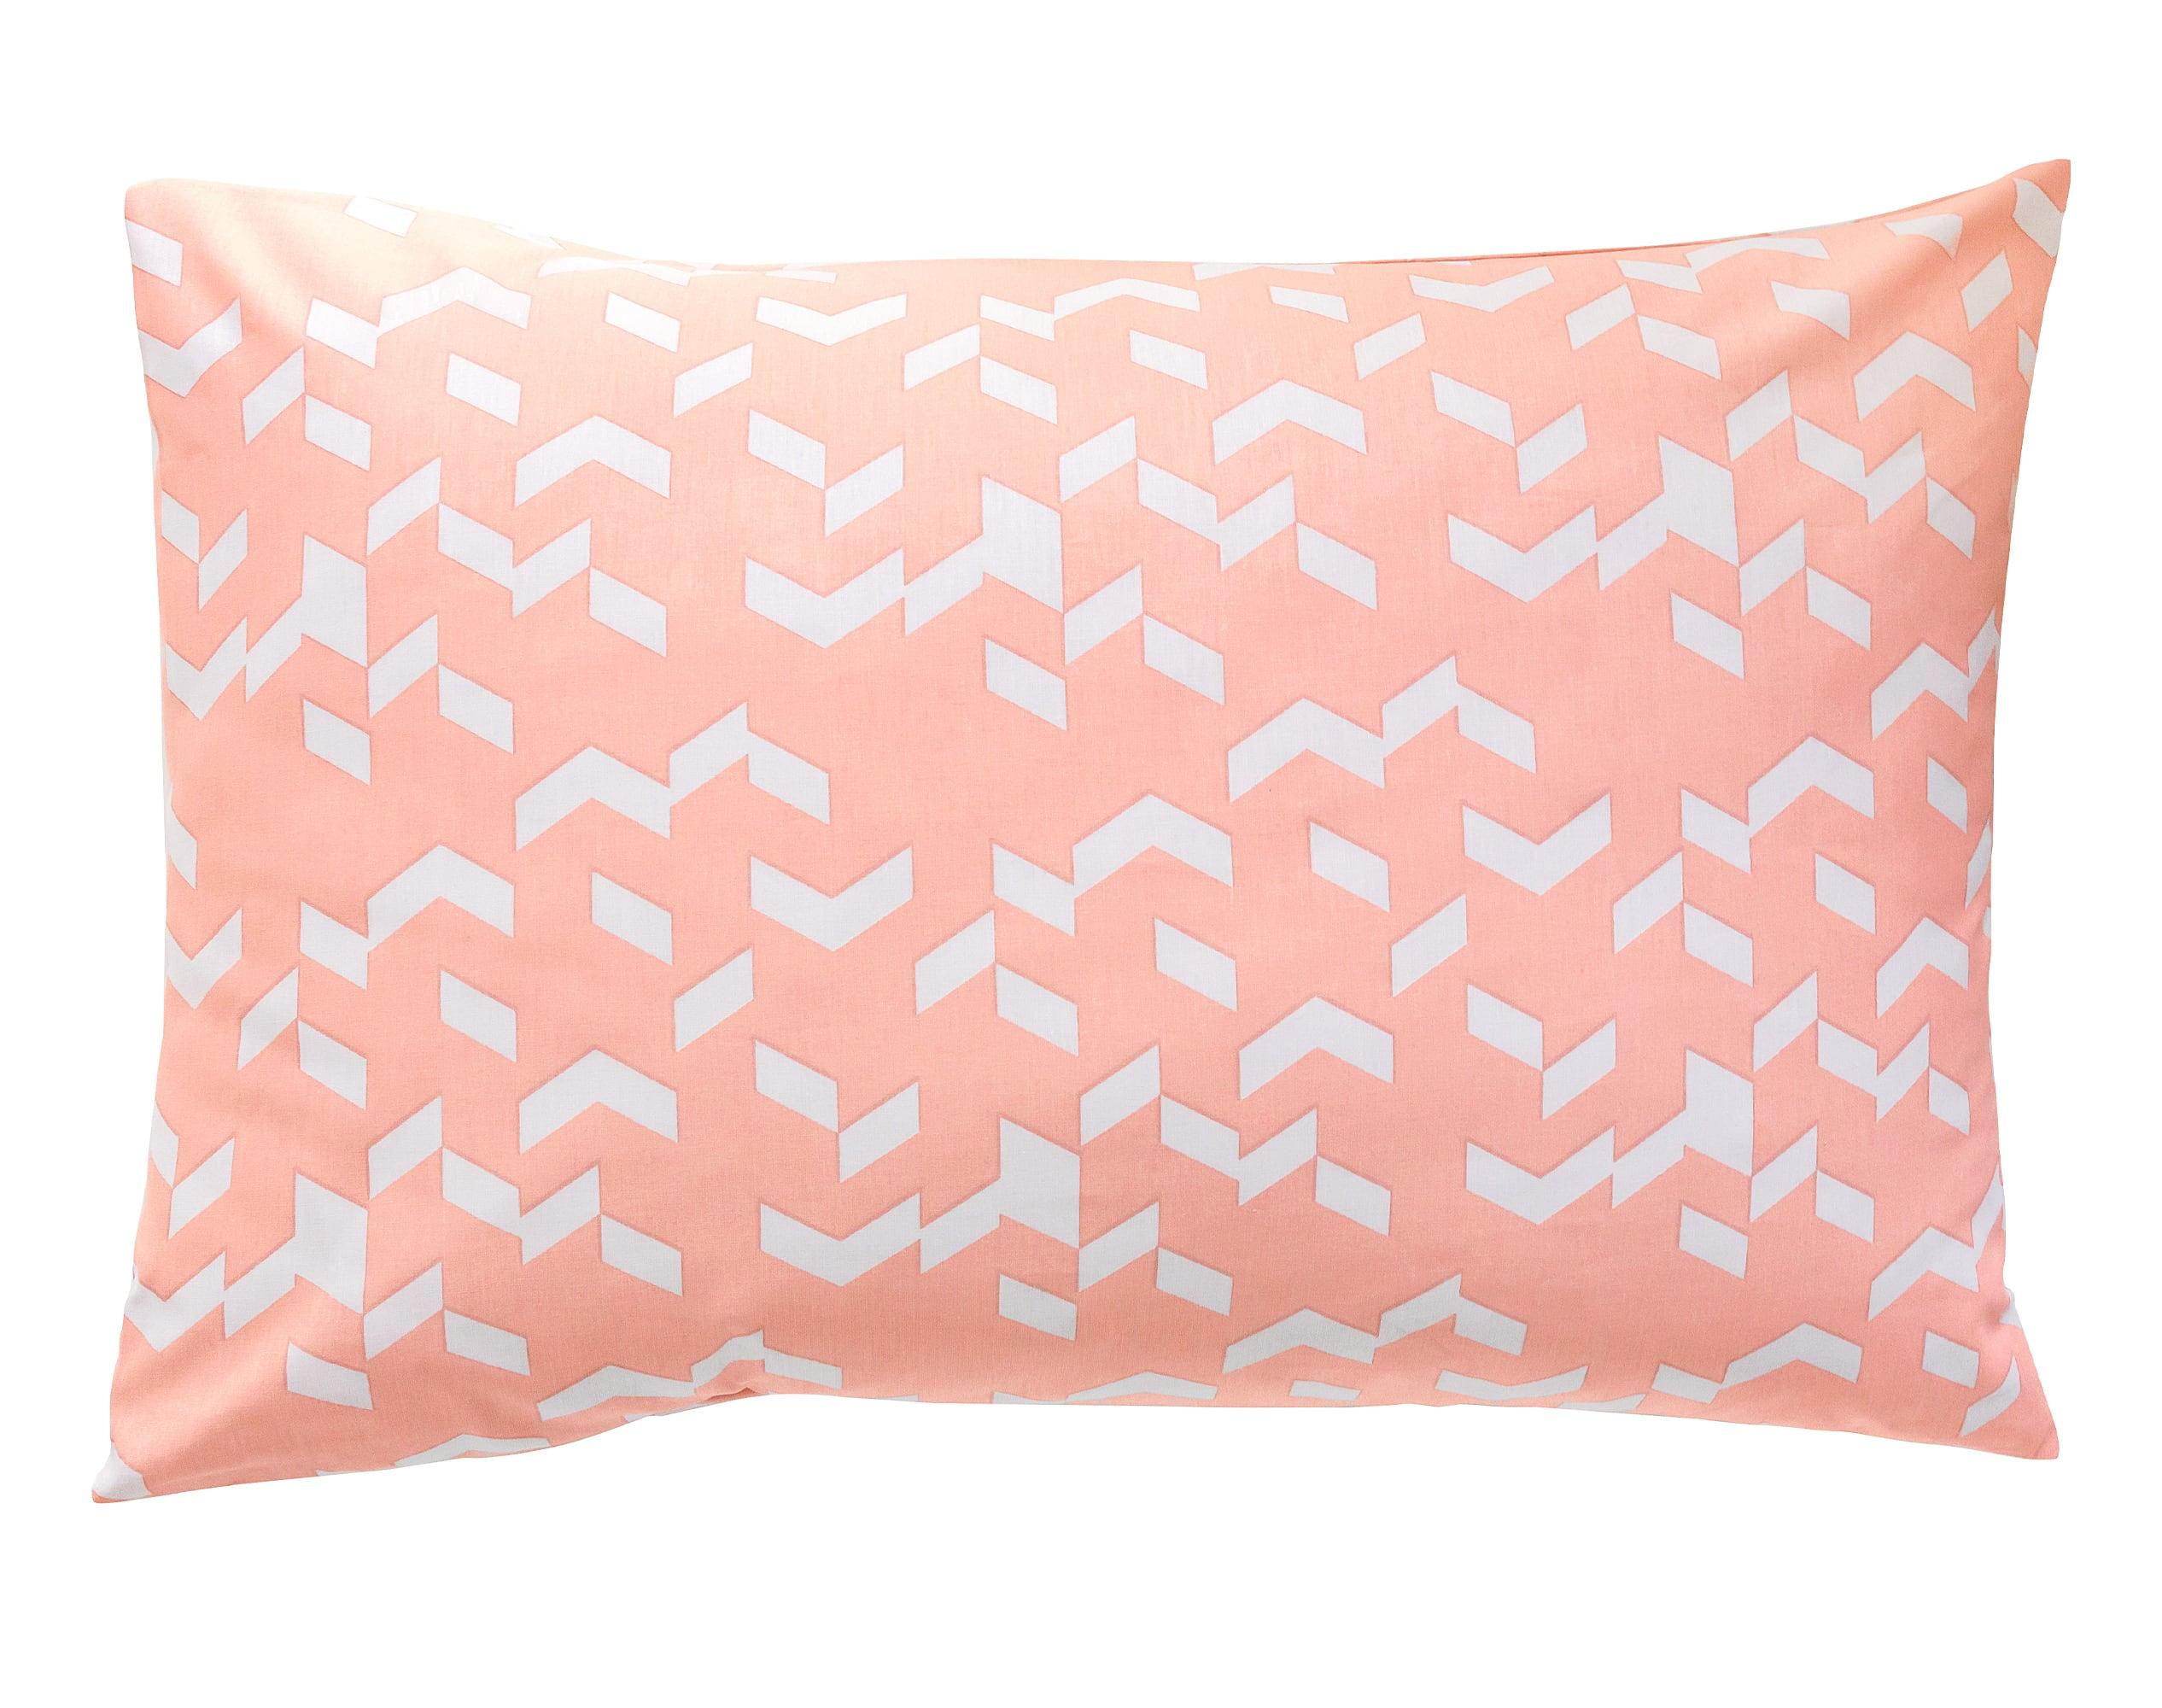 Taie d'oreiller 50x70 en coton rose